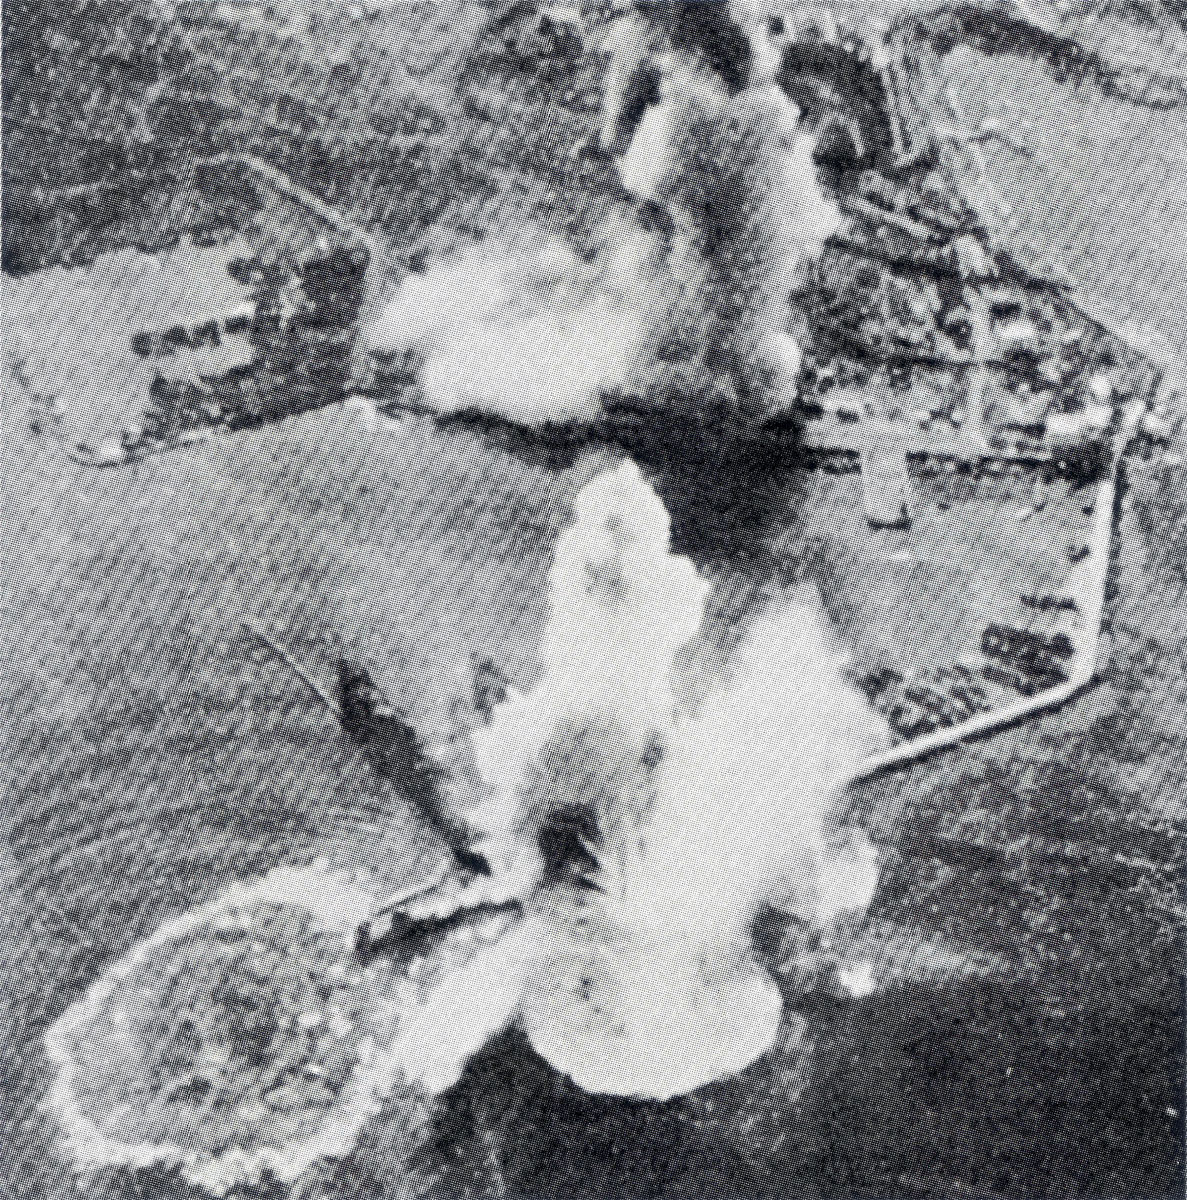 kg307-raid-on-piraeus-harbour-by-hptm-hajo-herrmann-april-6-7-1941-01